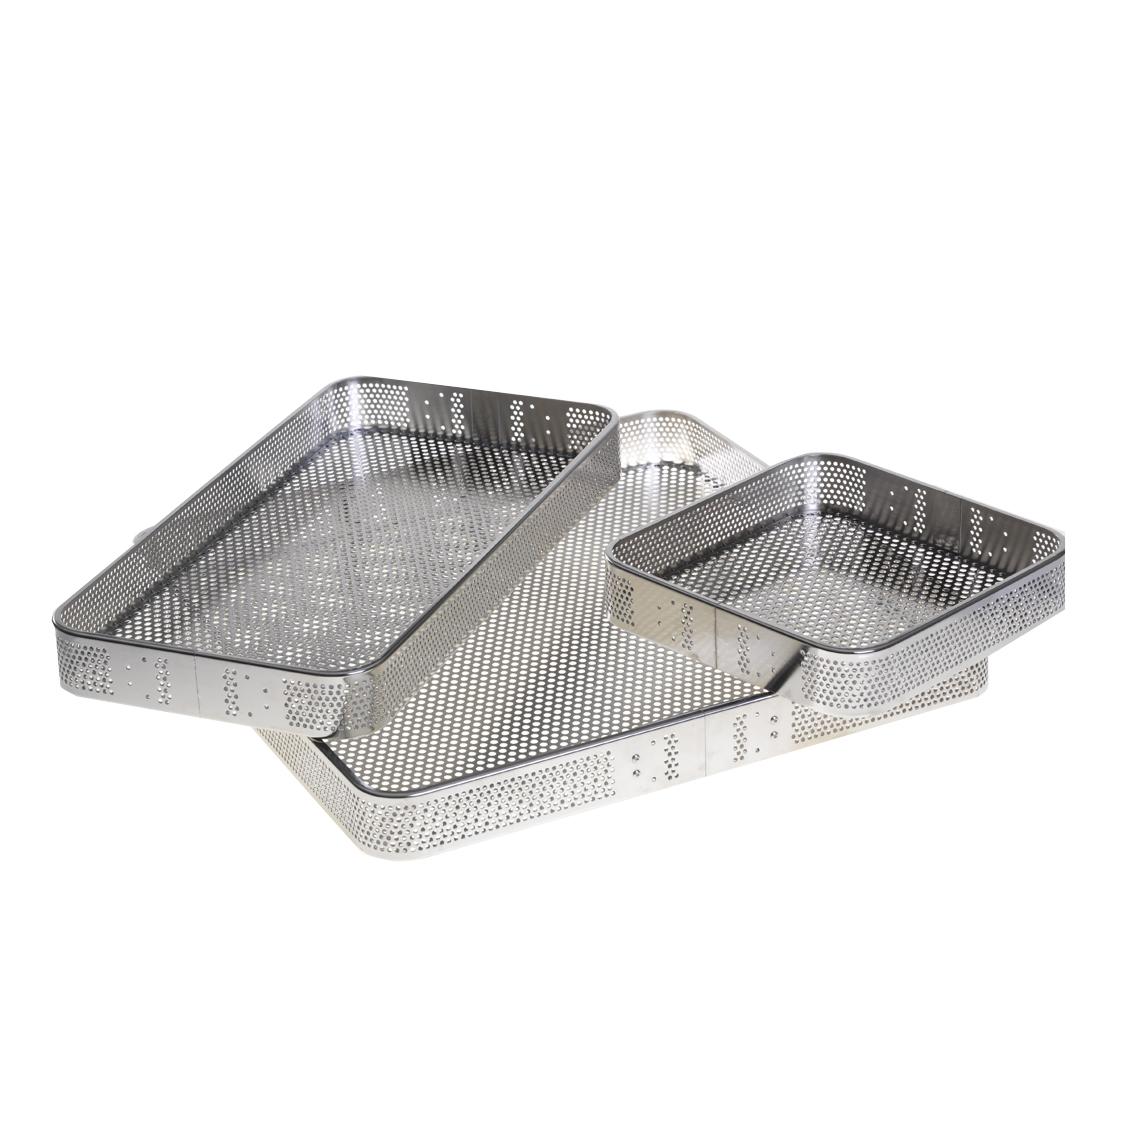 Clinipak Premium Din Basket Image